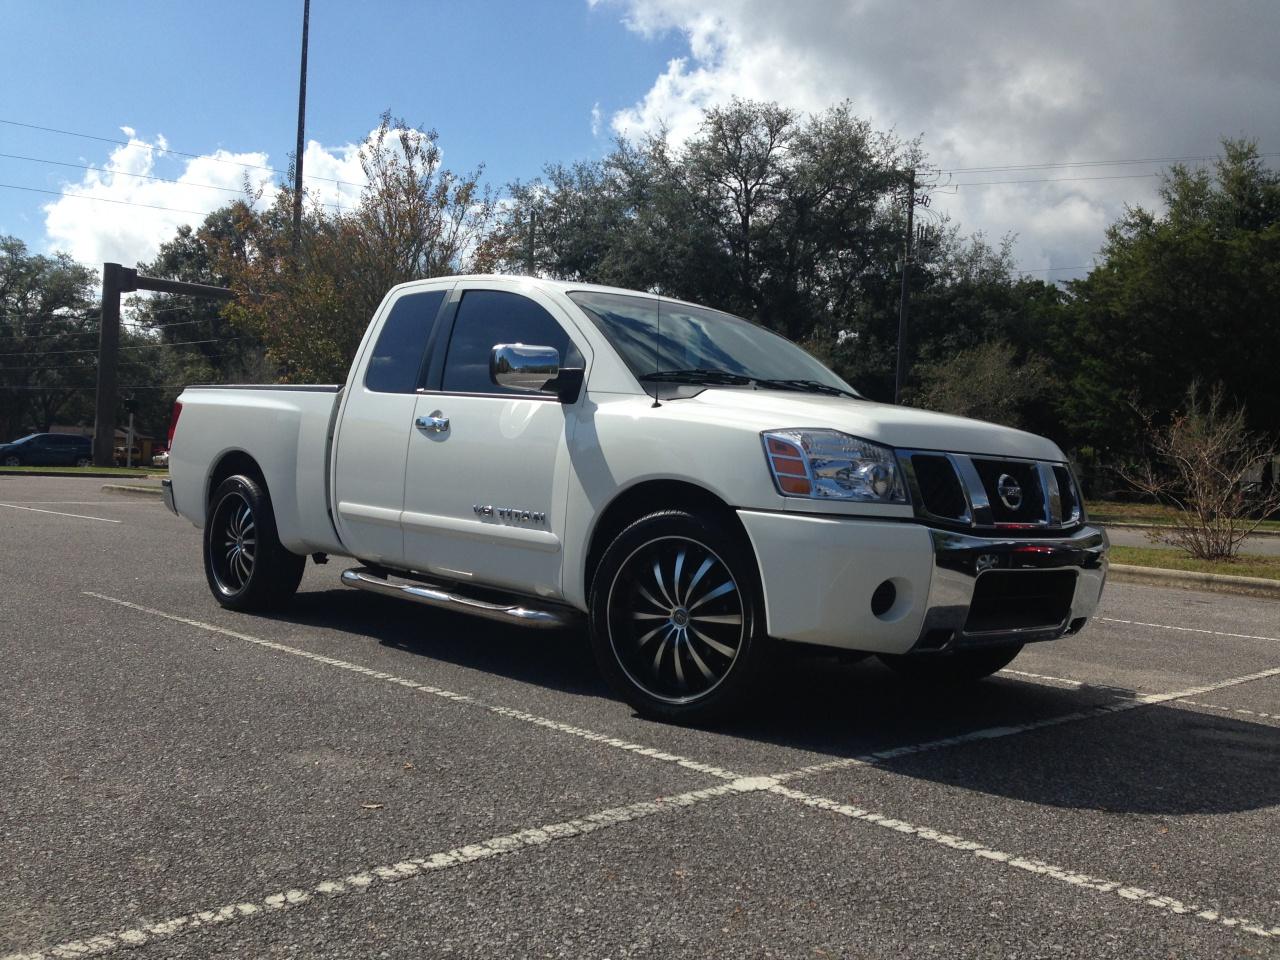 For sale Nissan Titan 7500$-img_0067-jpg